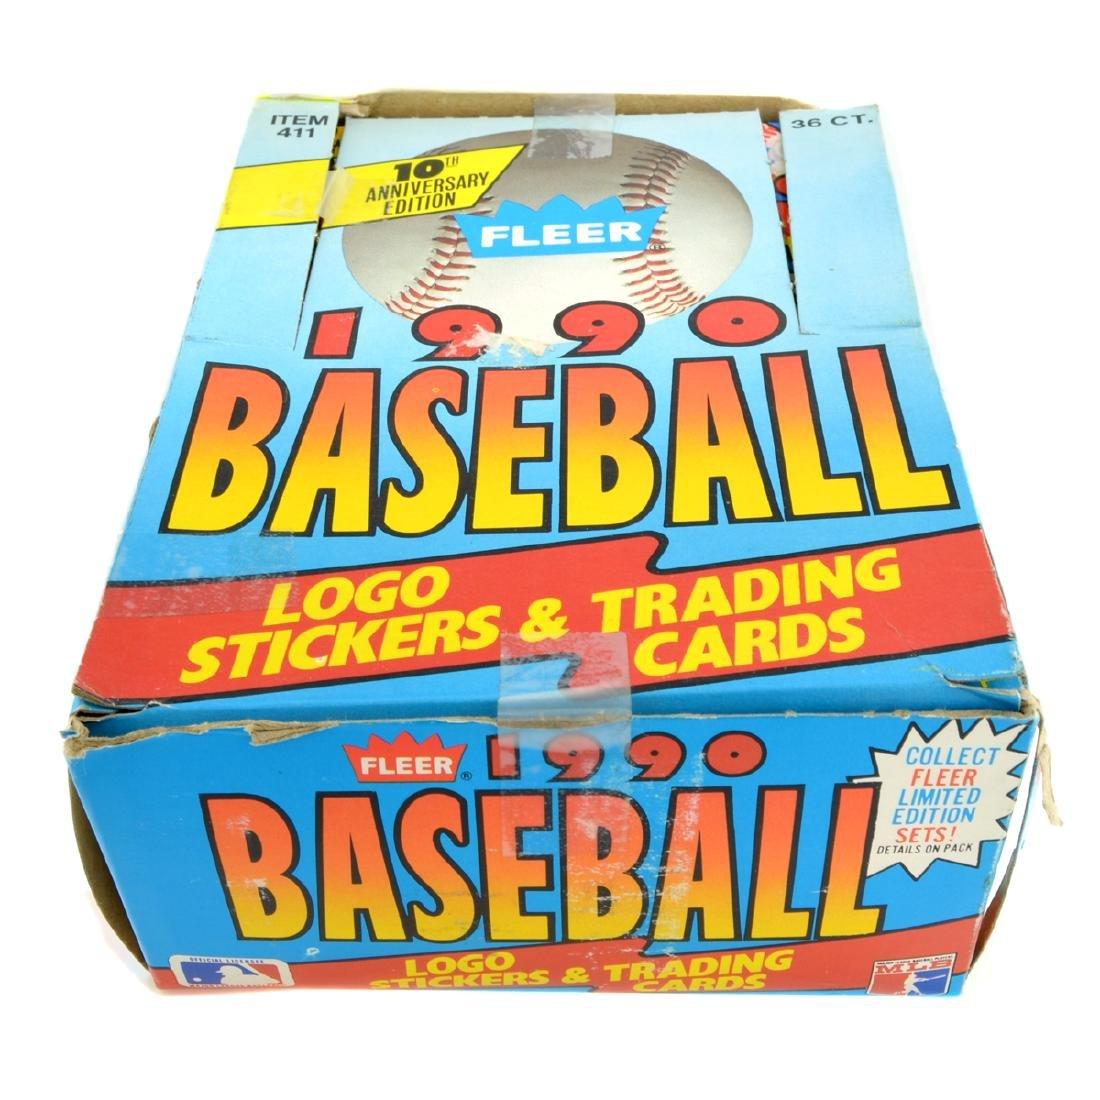 Limited Edition 1990 Fleer Baseball Card Set